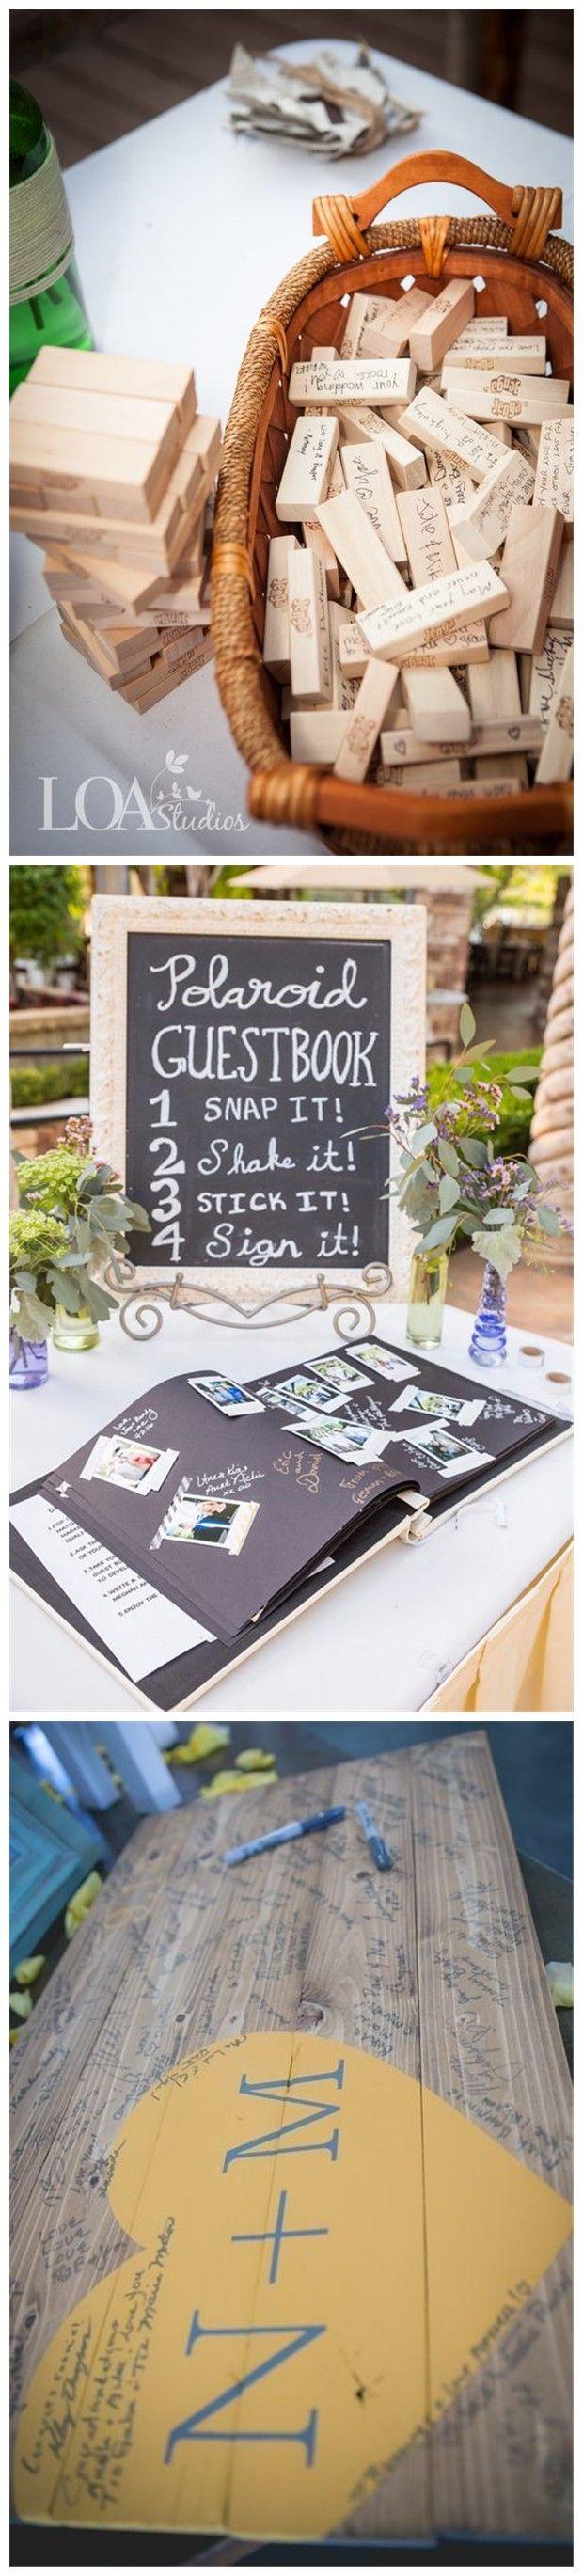 Wedding decorations 2019   of Our Favorite Unique Wedding Guest Book Ideas  Wedding